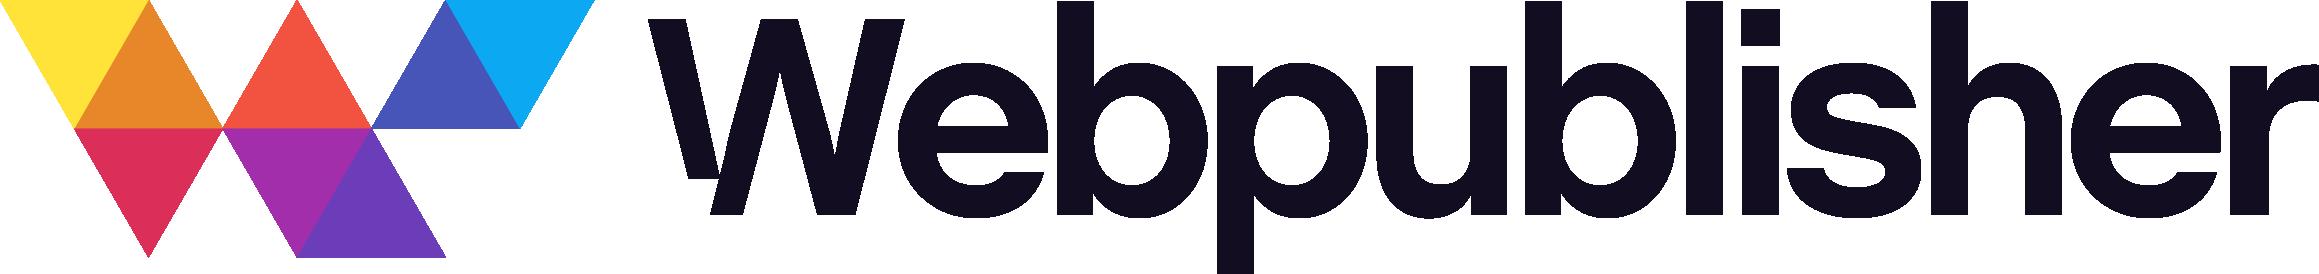 Programmatic Website Builder needs an elegant logo